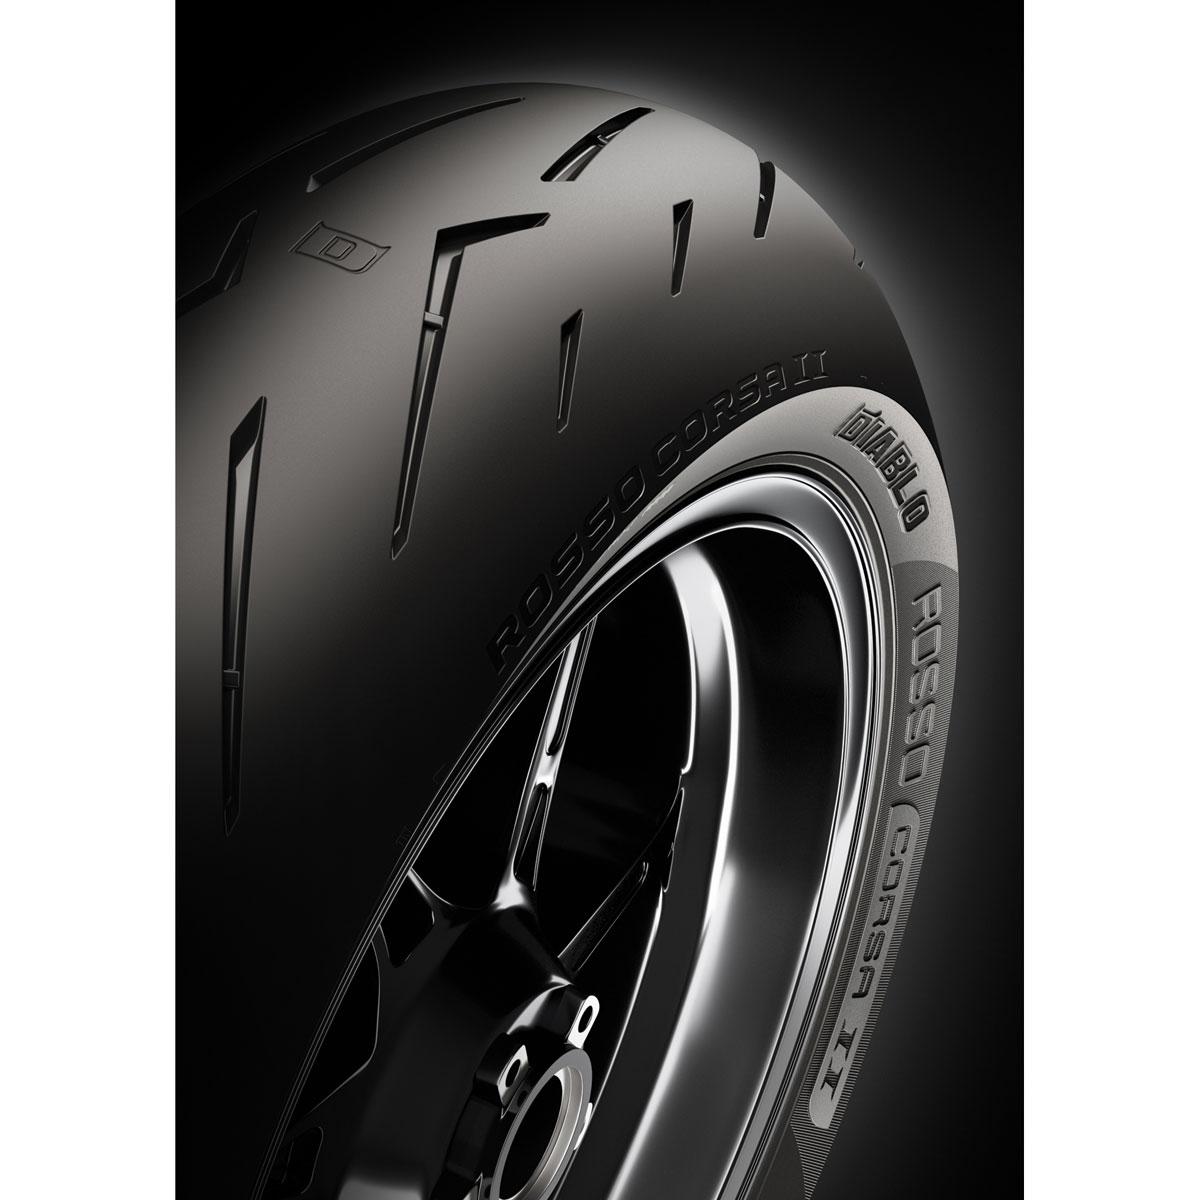 Pirelli Diablo Rosso Corsa Tires - Cycle Gear